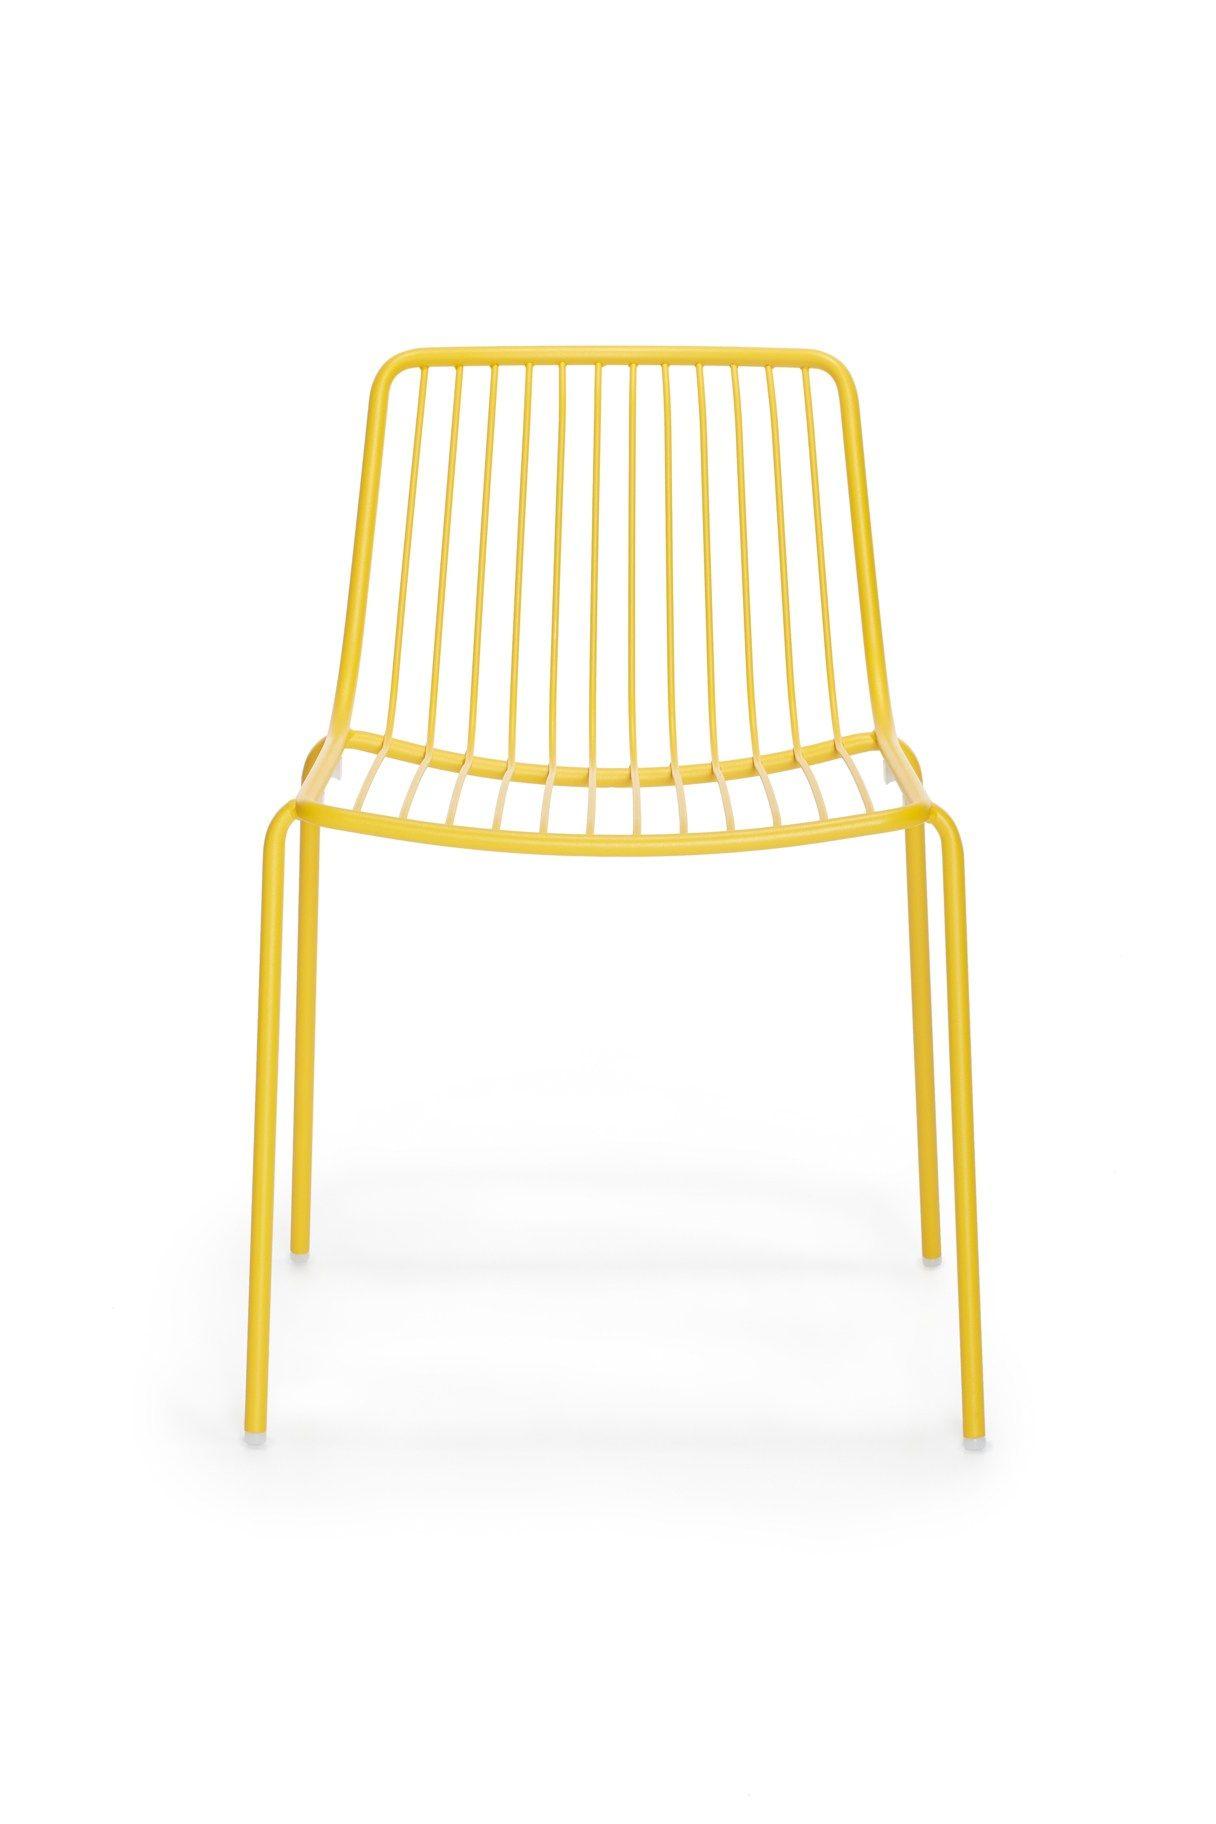 Metal #garden #chair Nolita 3650   PEDRALI #yellow